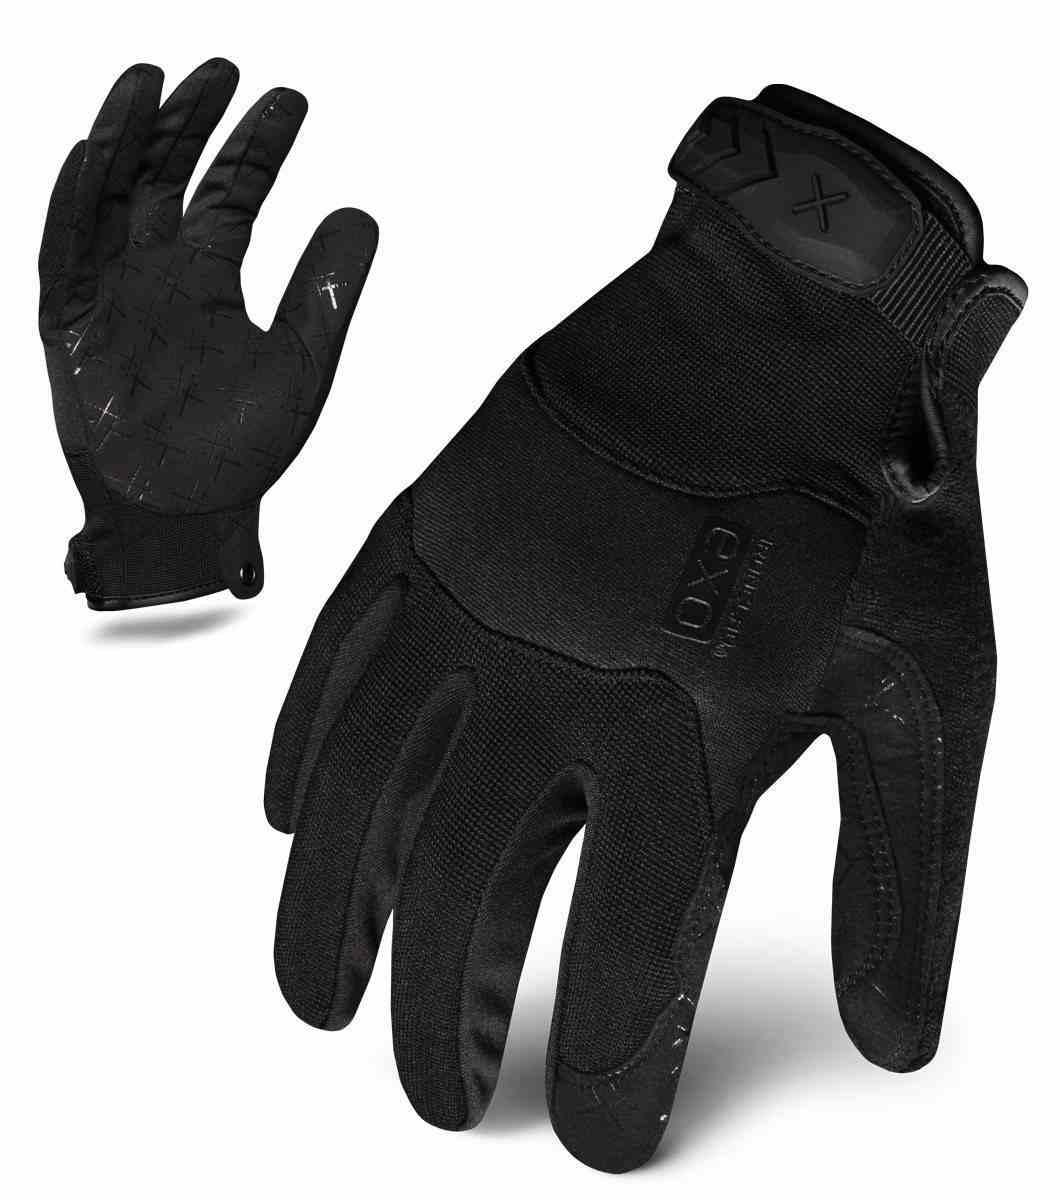 Ironclad Tactical Pro Black